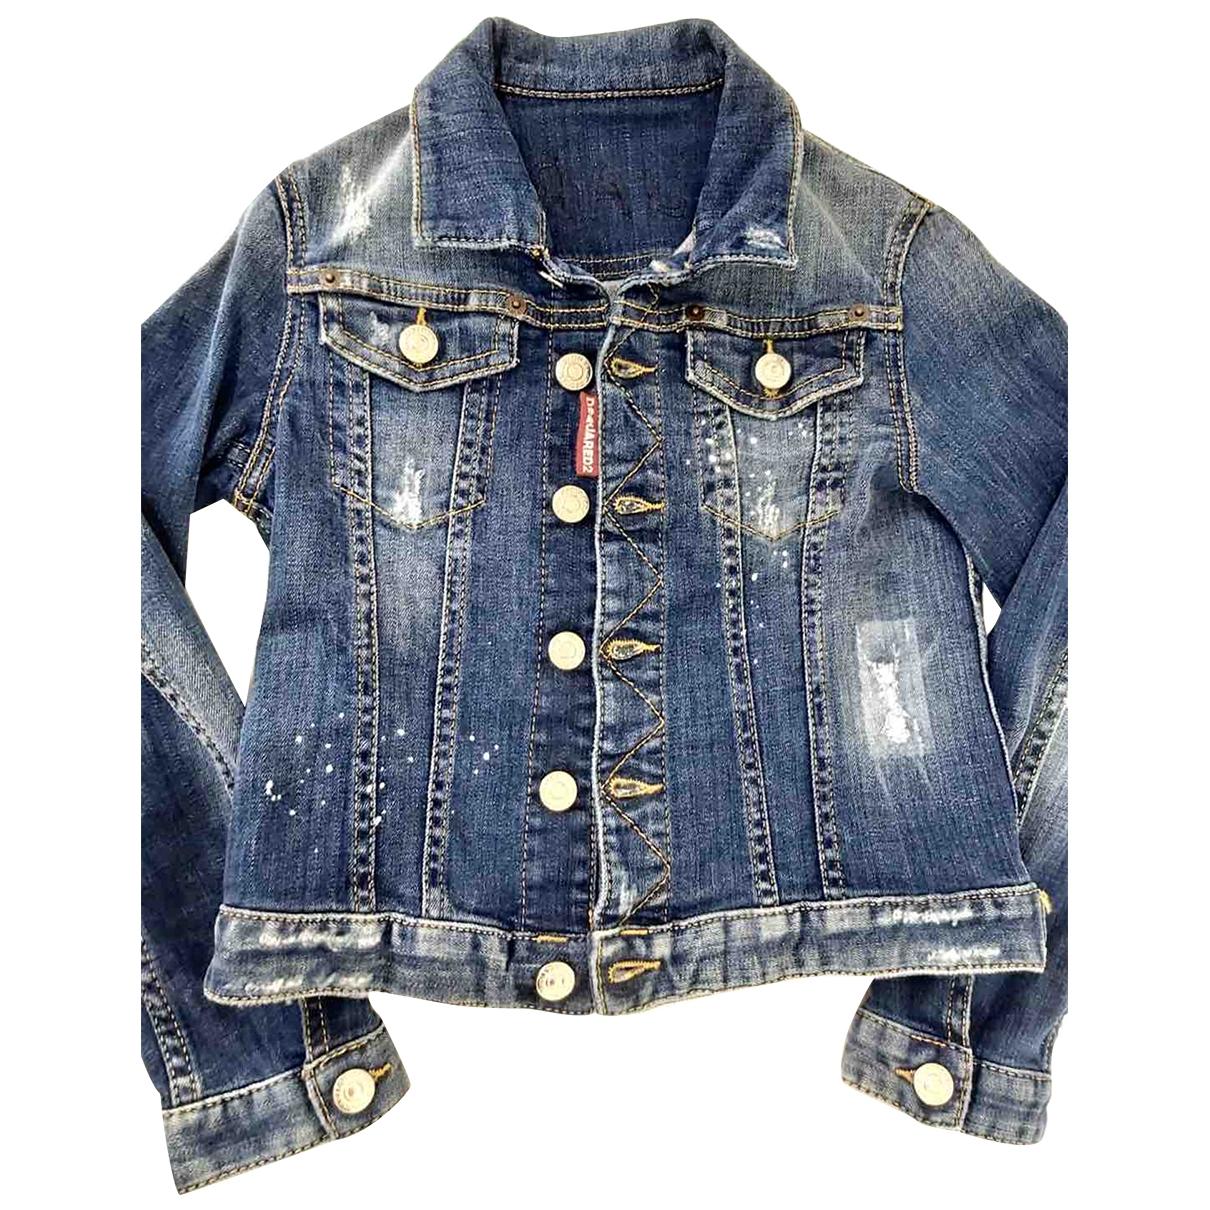 Dsquared2 \N Blue Denim - Jeans jacket & coat for Kids 8 years - up to 128cm FR